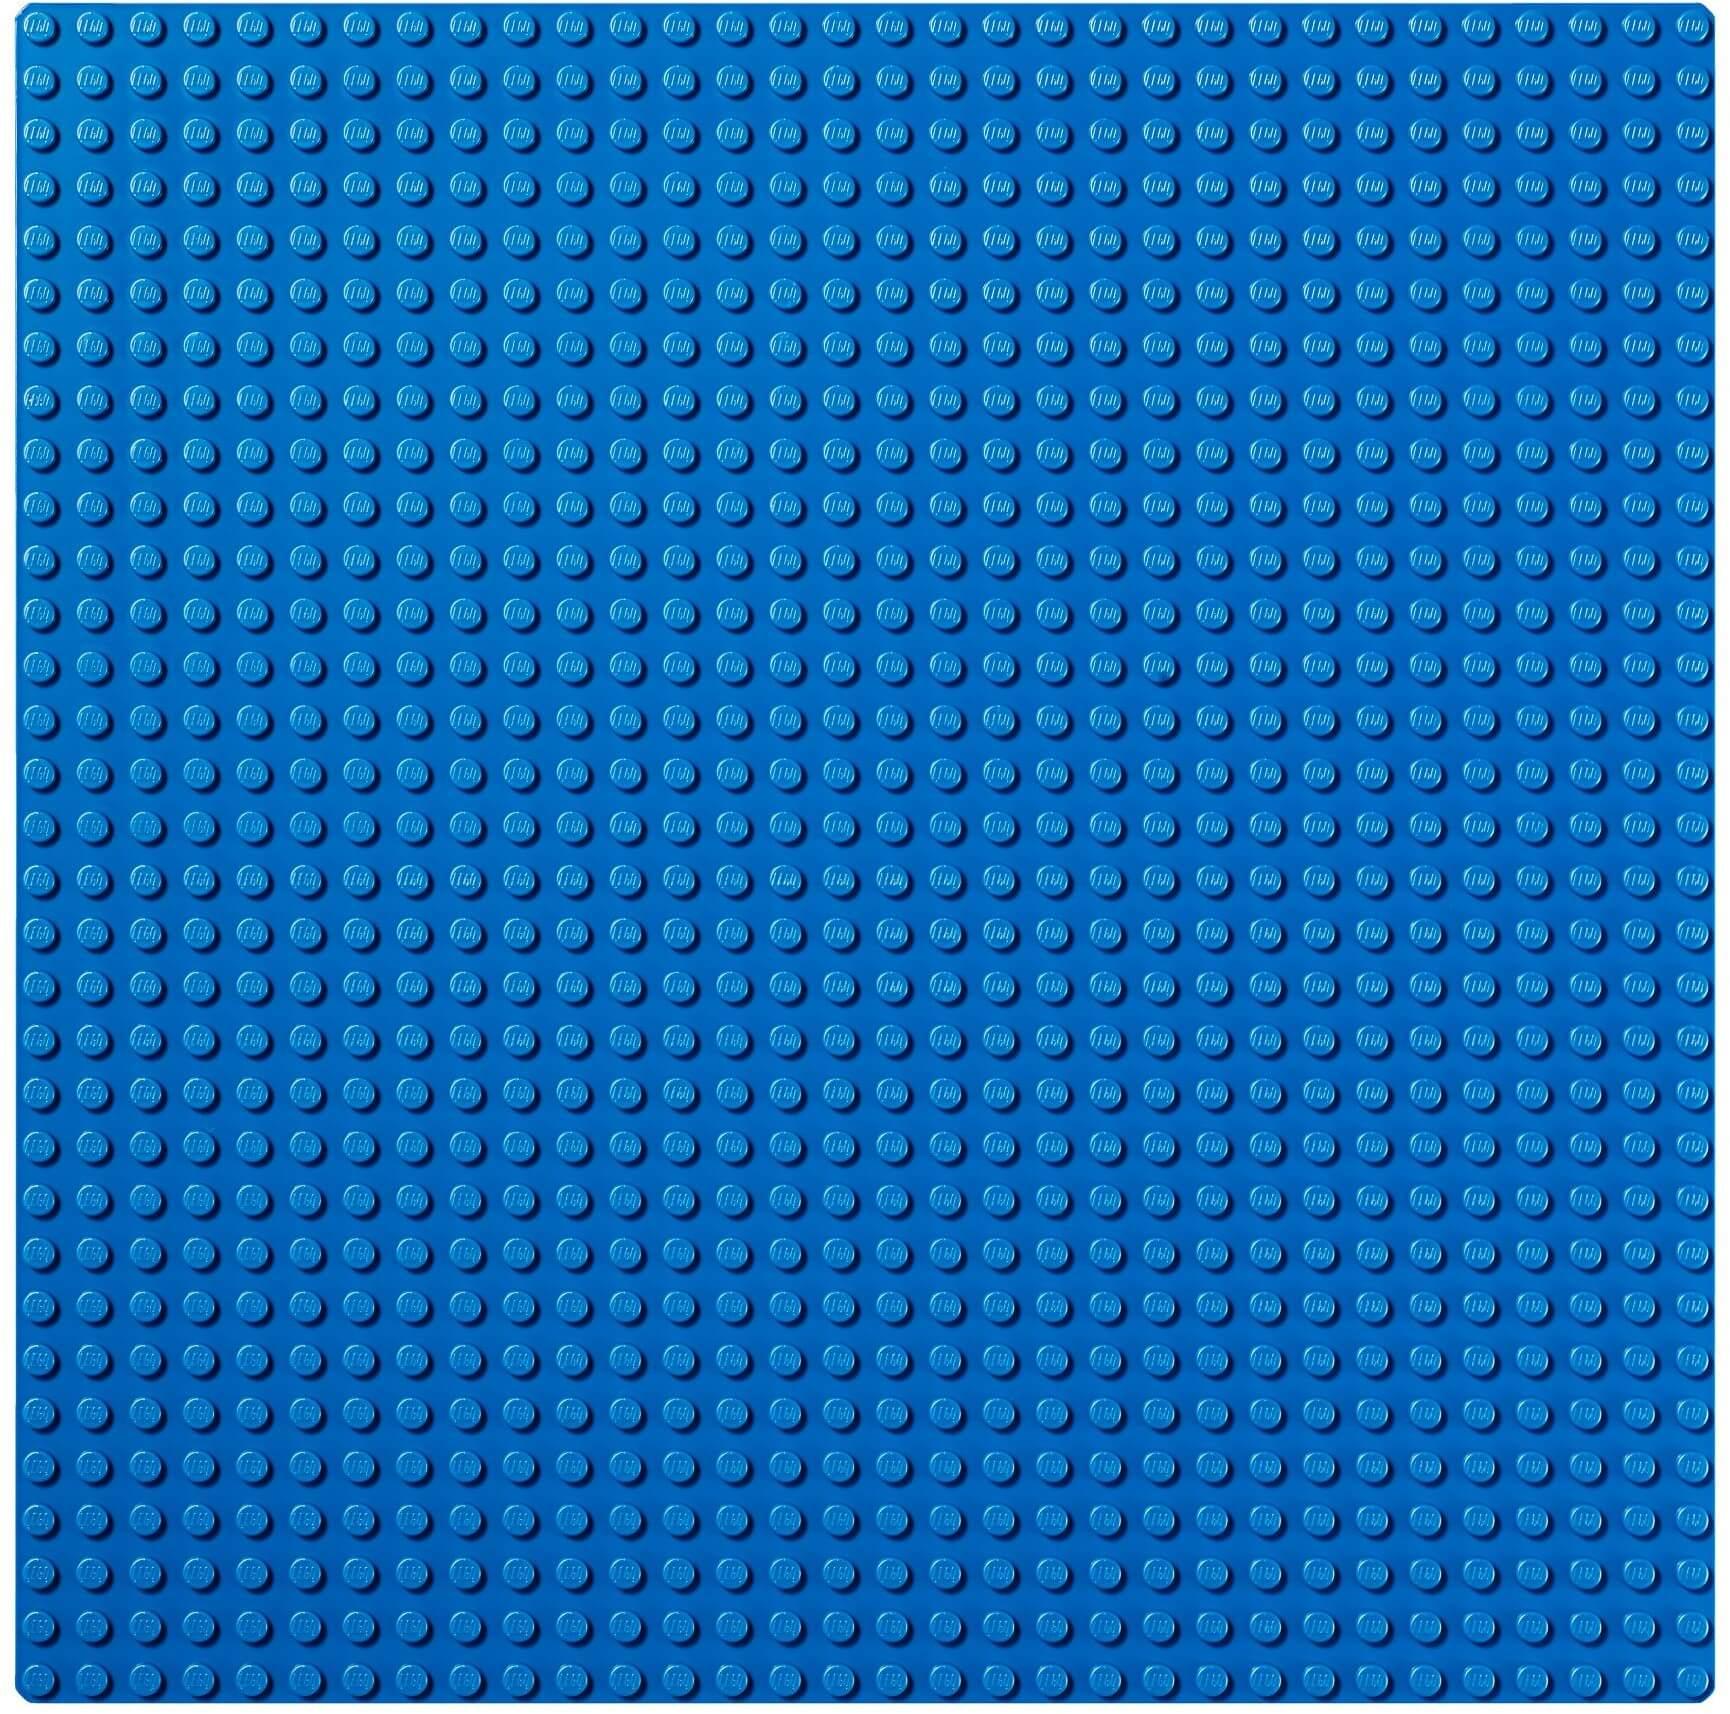 Mua đồ chơi LEGO 10714 - LEGO Classic 10714 - Tấm nền Xanh (LEGO Classic 10714 Blue Baseplate)